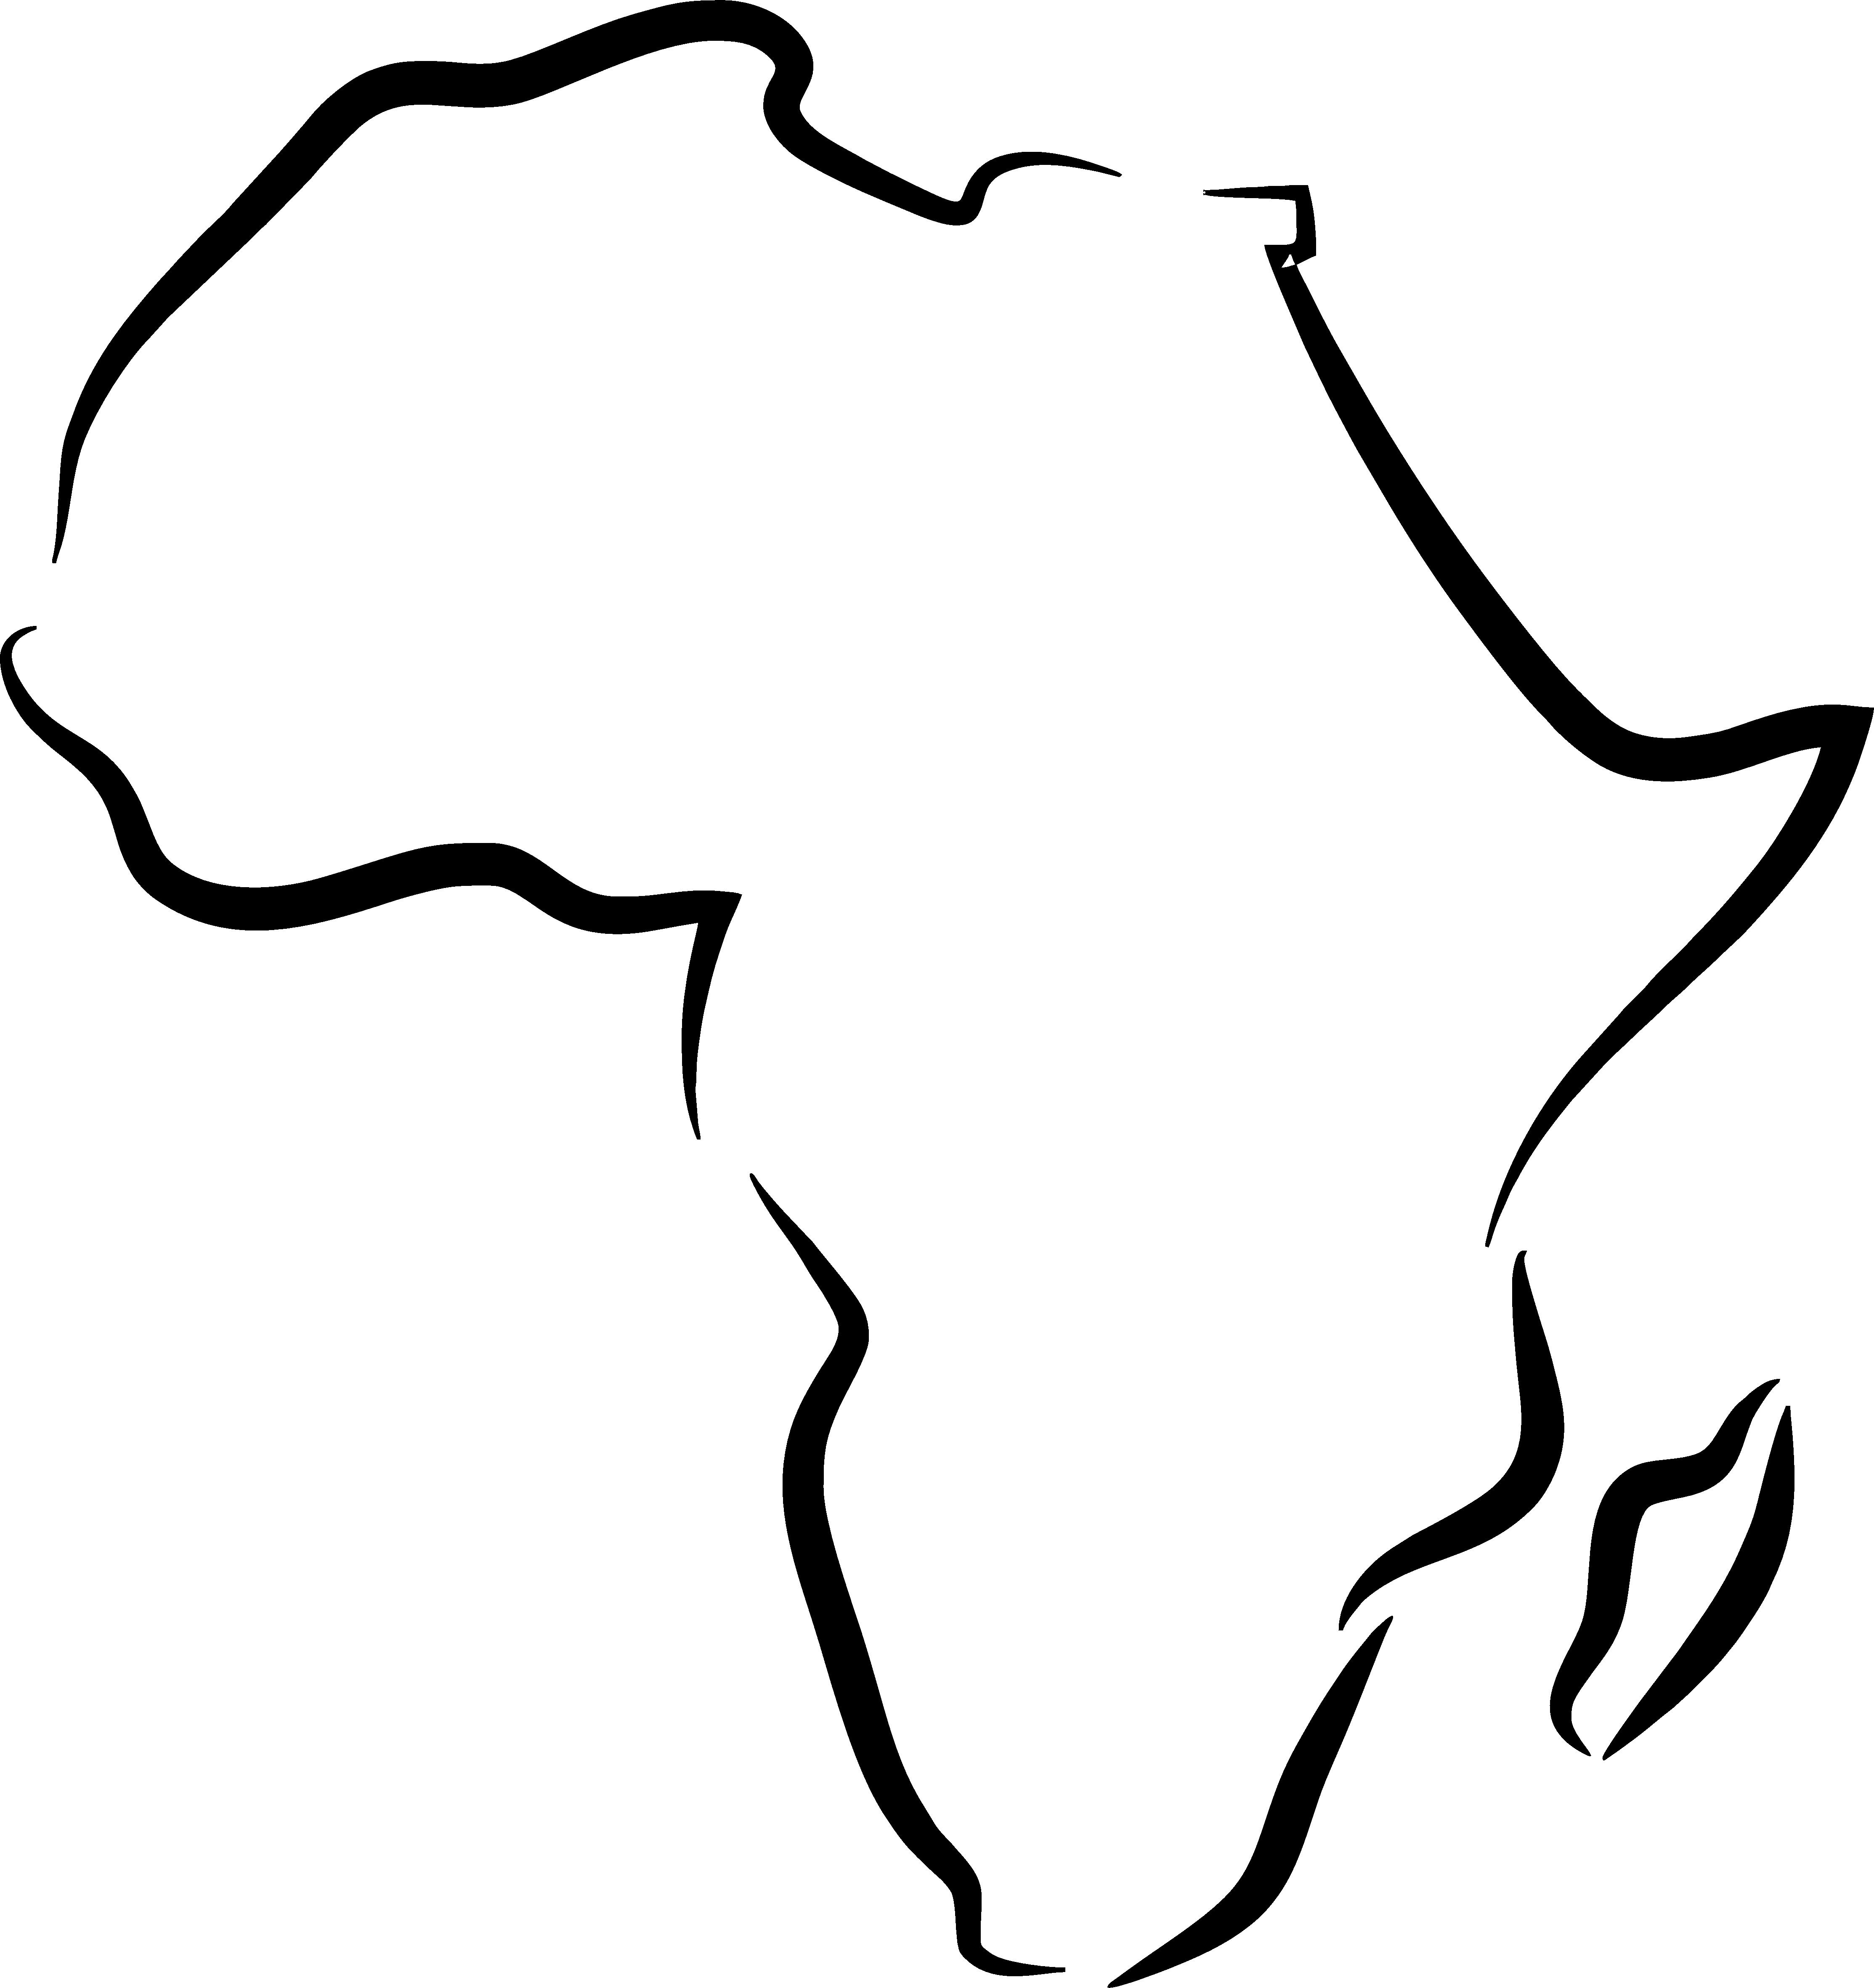 Continent clipart africa Clipart Art Clip Image Clip